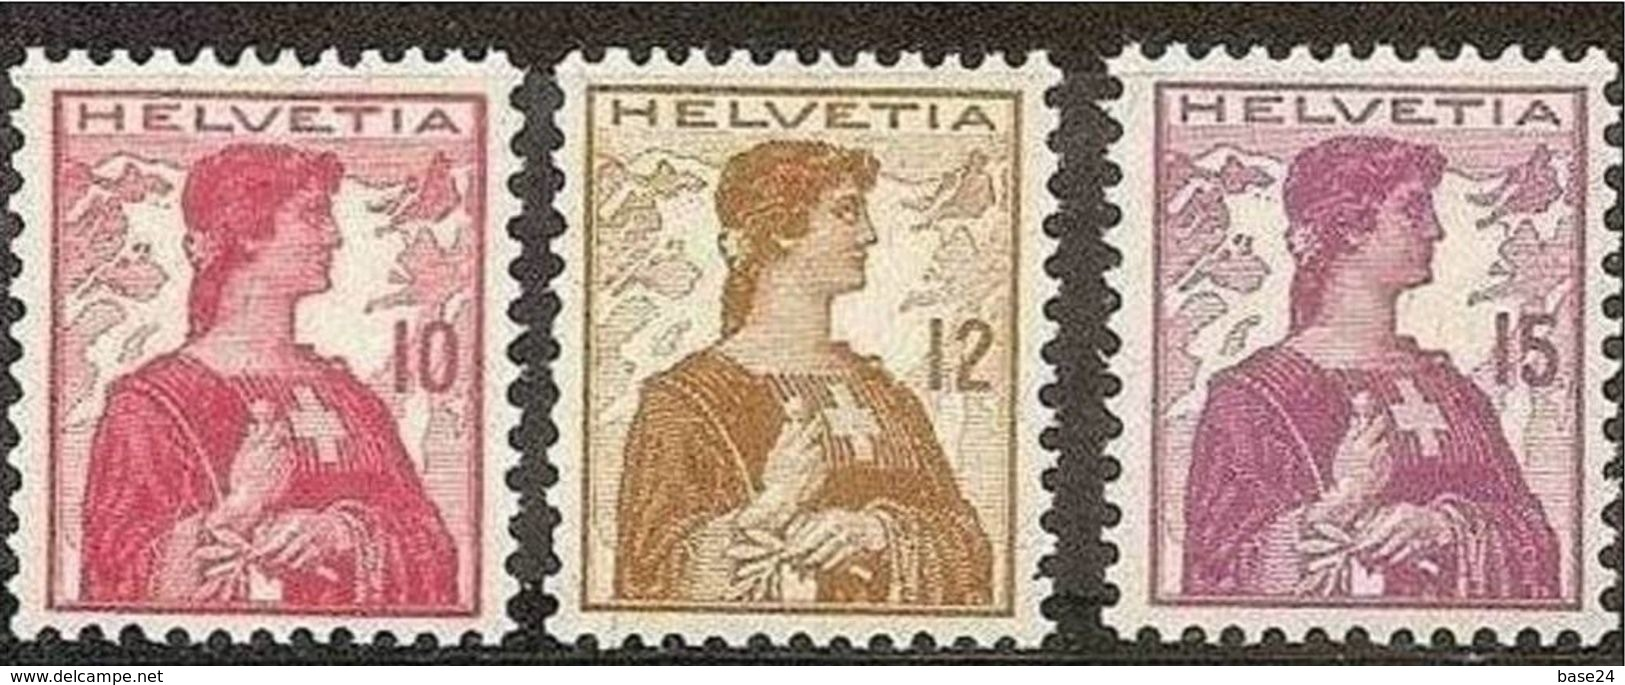 1909 Svizzera Switzerland HELVETIA BUSTO Serie Di 3v. (131/33), MNH** - Nuovi